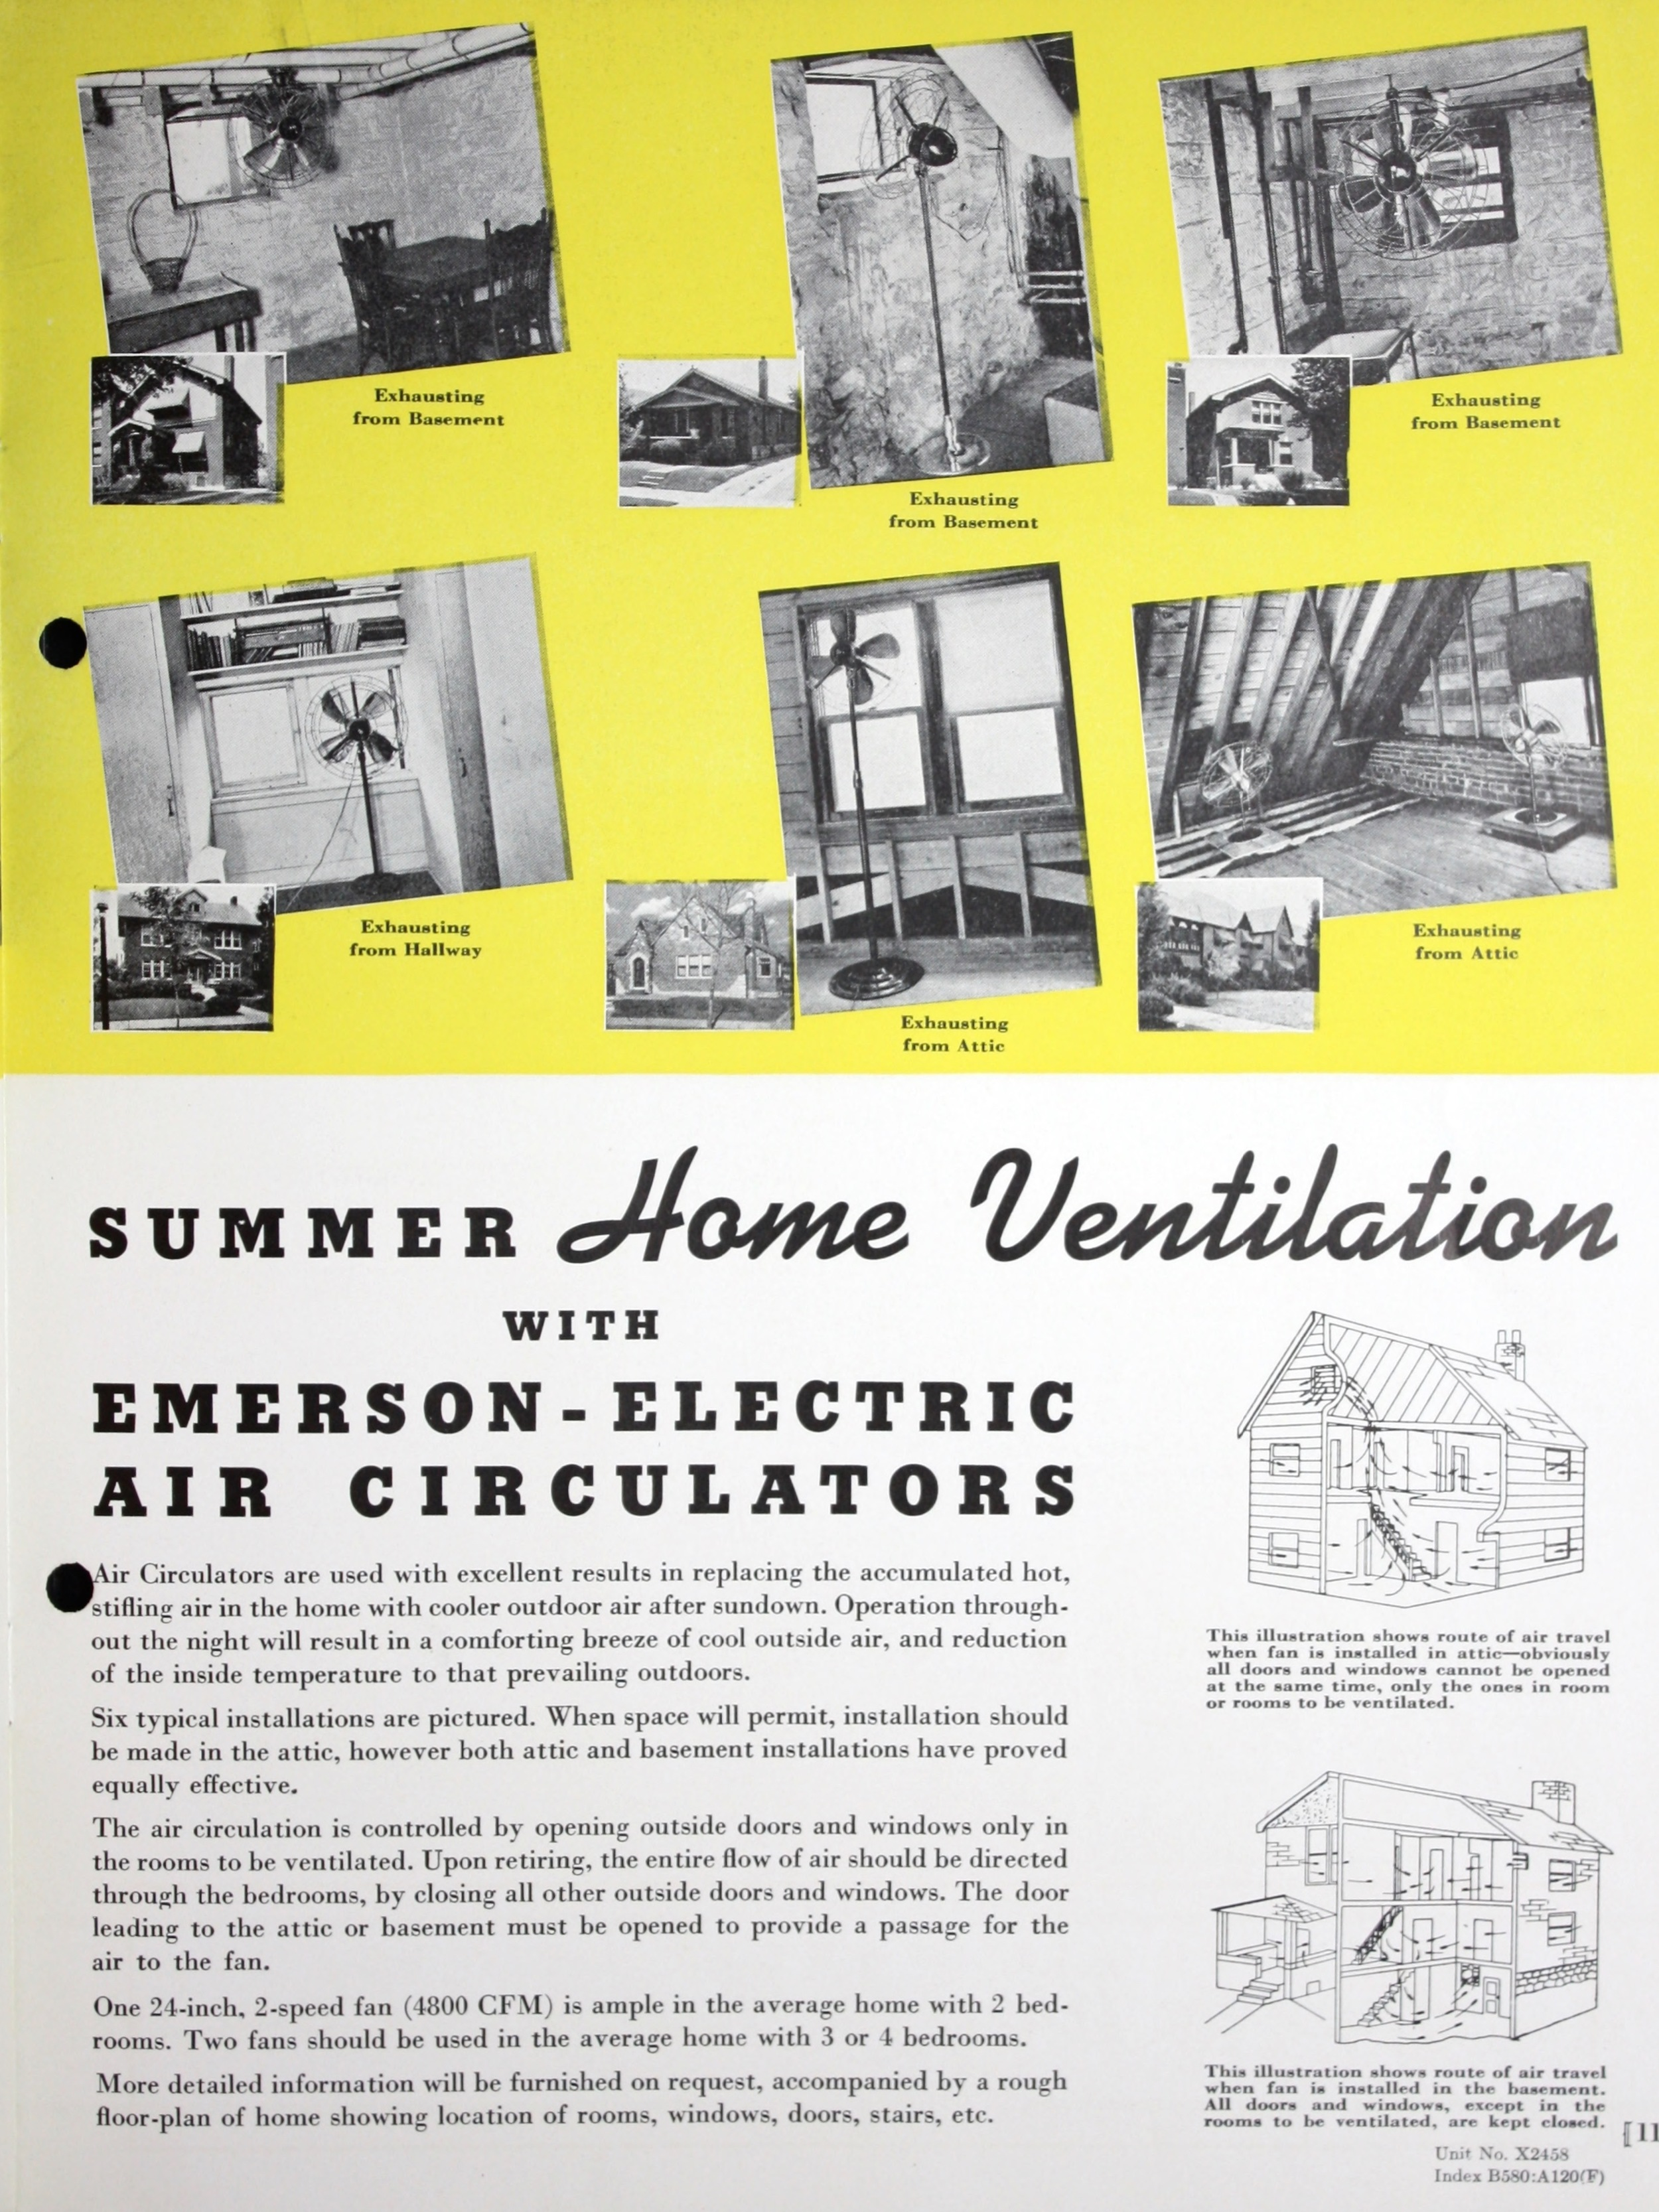 EmersonElectricMfgCoCca42784_0010.jpg